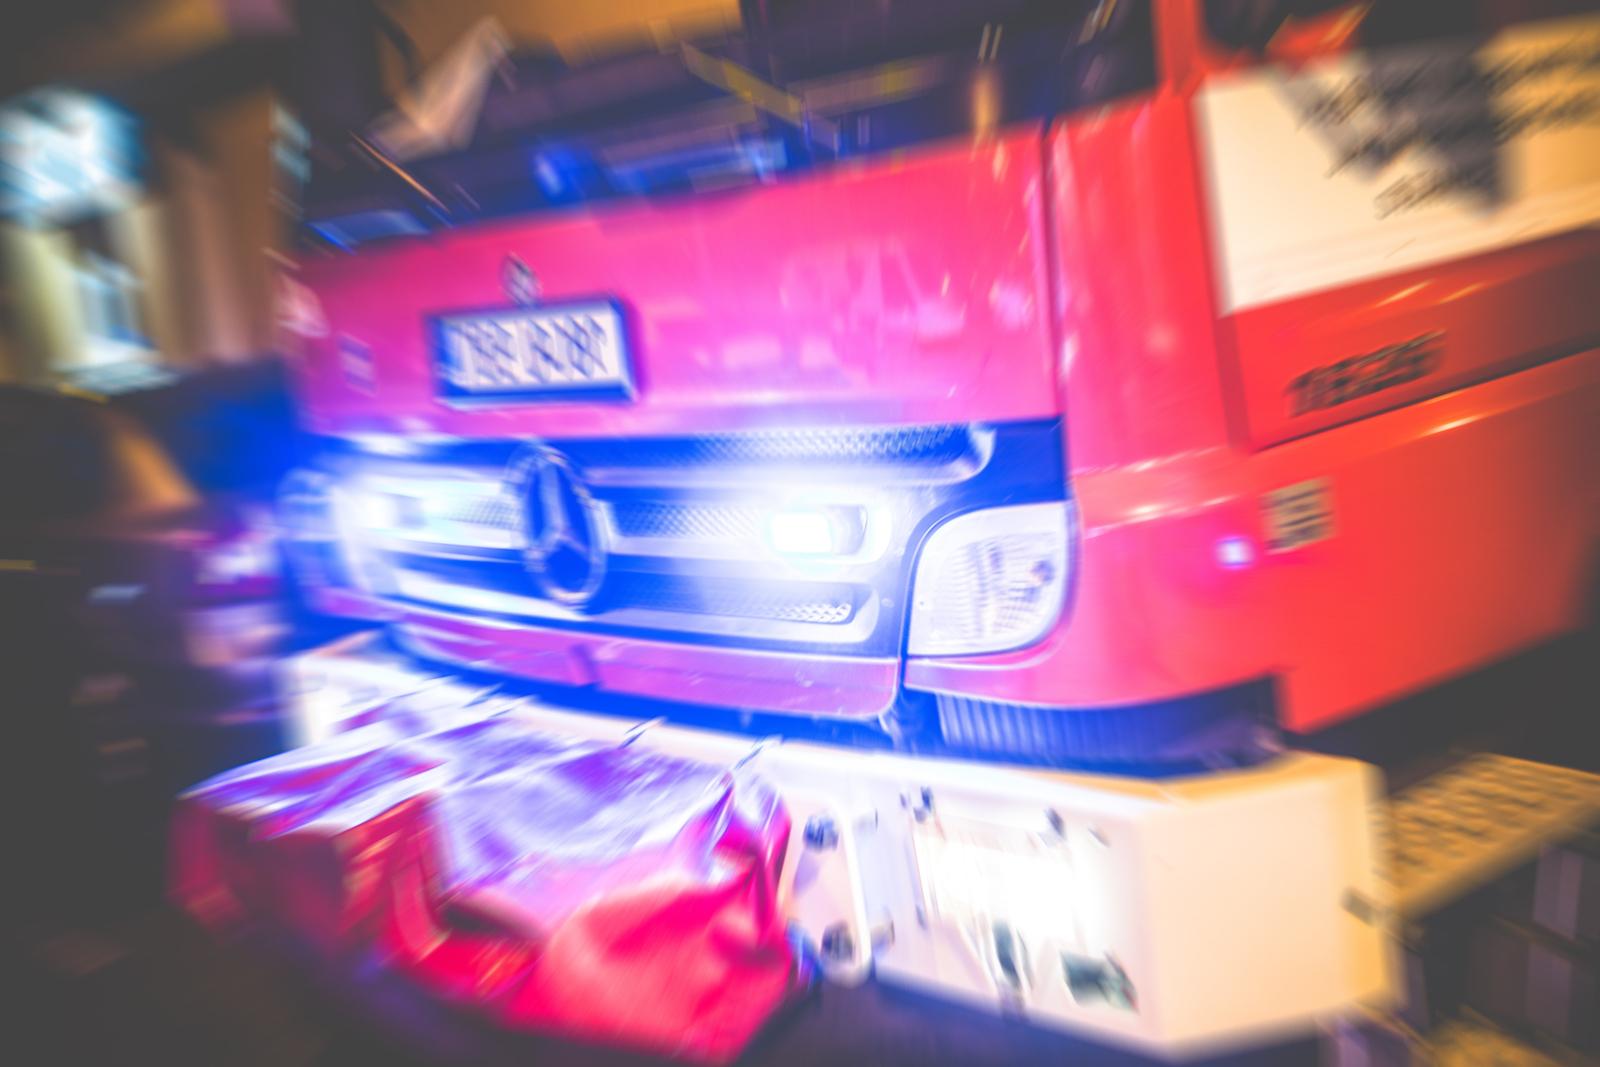 Ambulance illuminated in the dark of night.